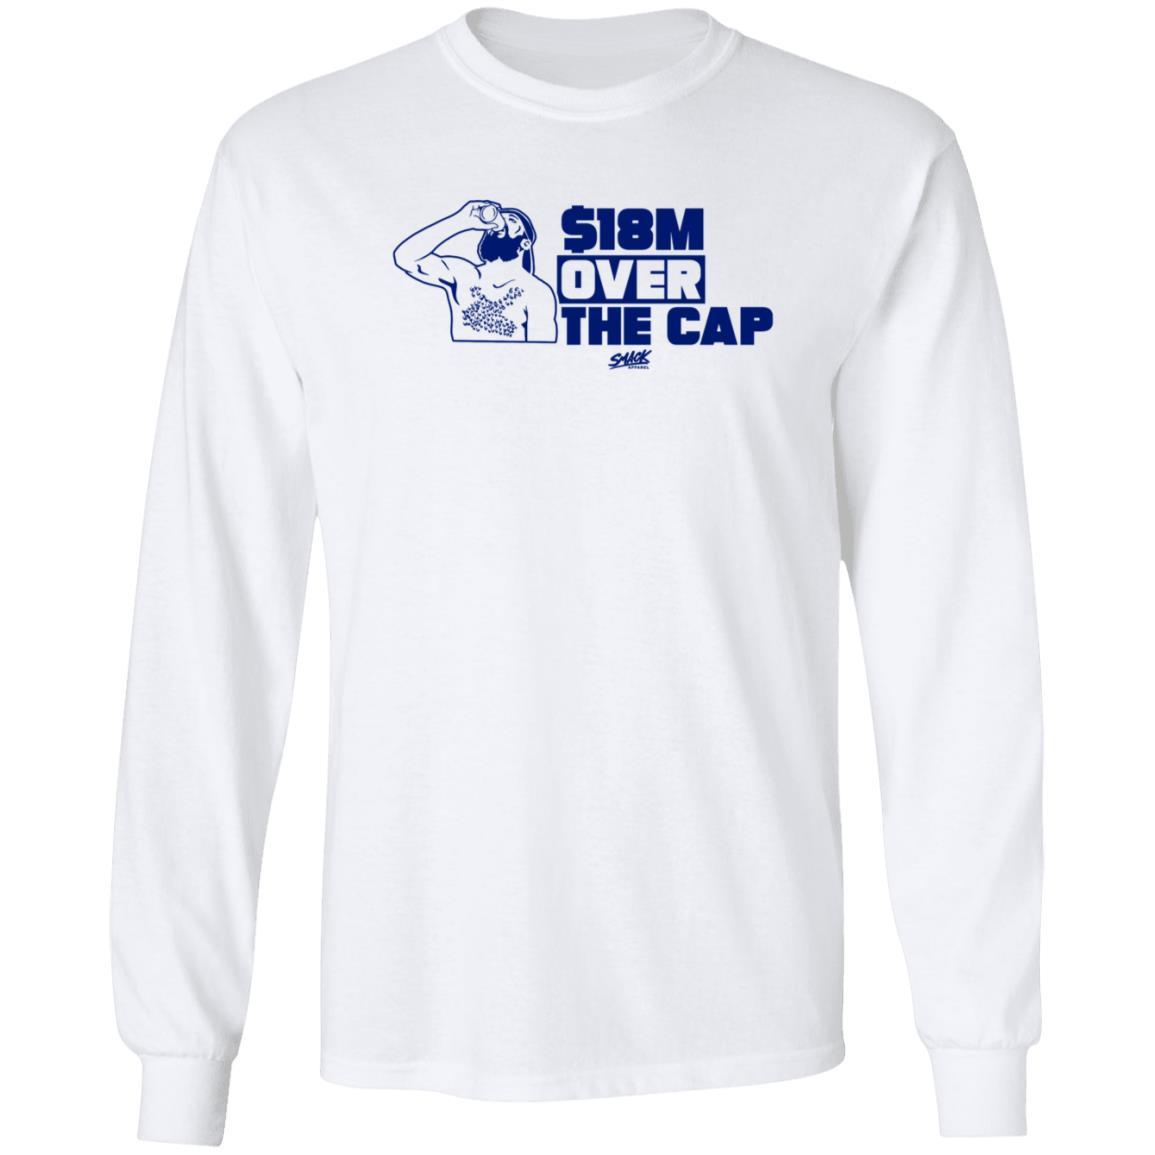 $18M (Million) Over the Cap Shirt Tampa Bay Hockey Apparel Tampa Hockey Championship Shirt